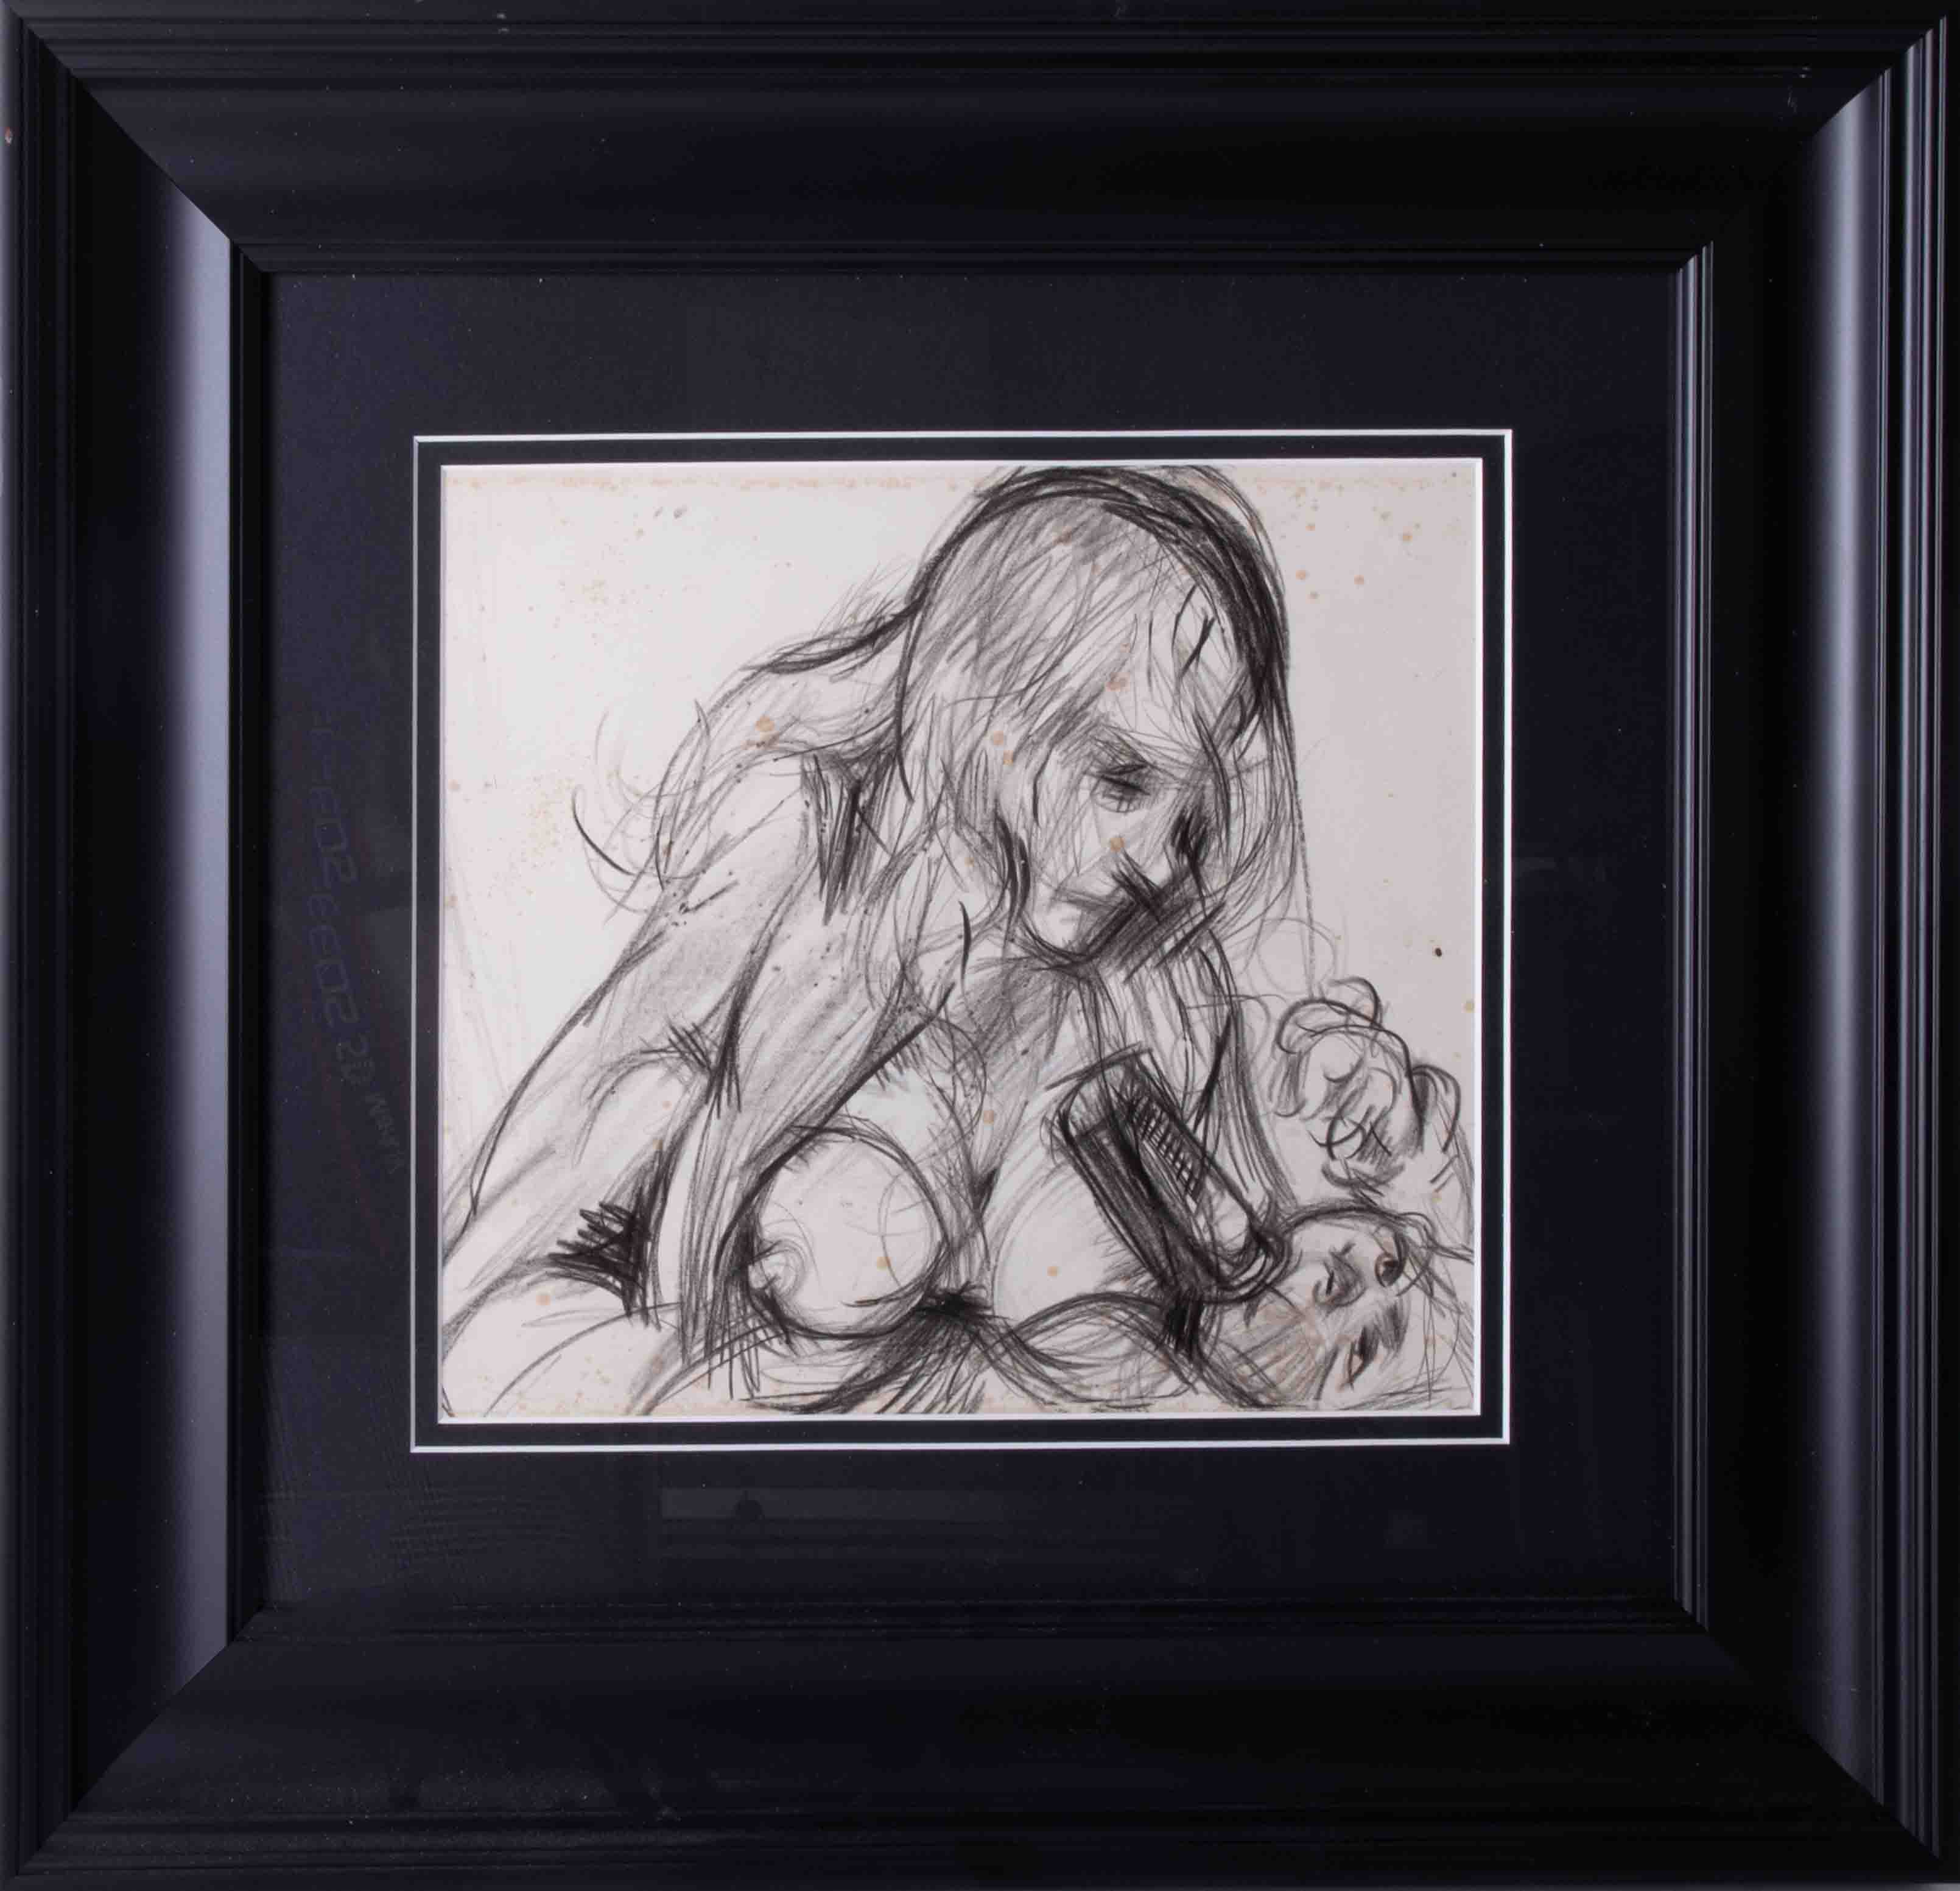 Robert Lenkiewicz (1941-2002), pencil sketch 'Mouse Feeding Wolfe', 23cm x 25cm, framed and glazed.